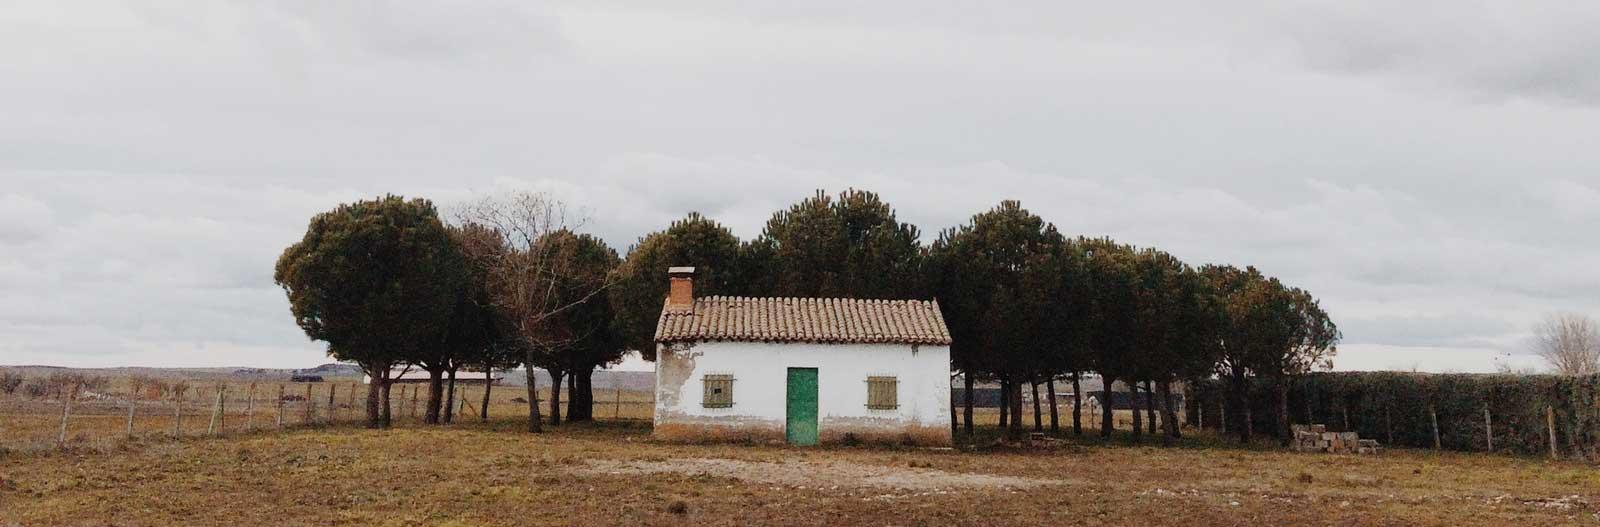 Piano-casa-Veneto-Zona-agricola